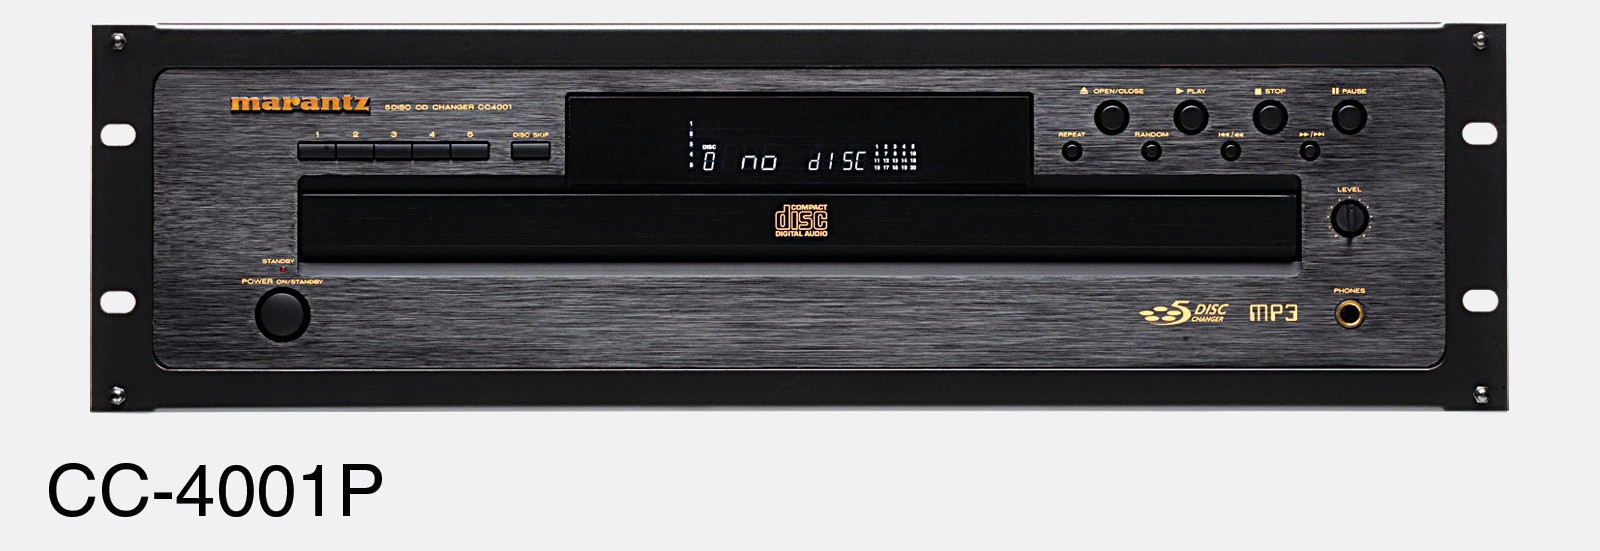 marantz cc 4001 pro cd player 3u 5 disc cd r rw mp3 s p dif rh canford co uk